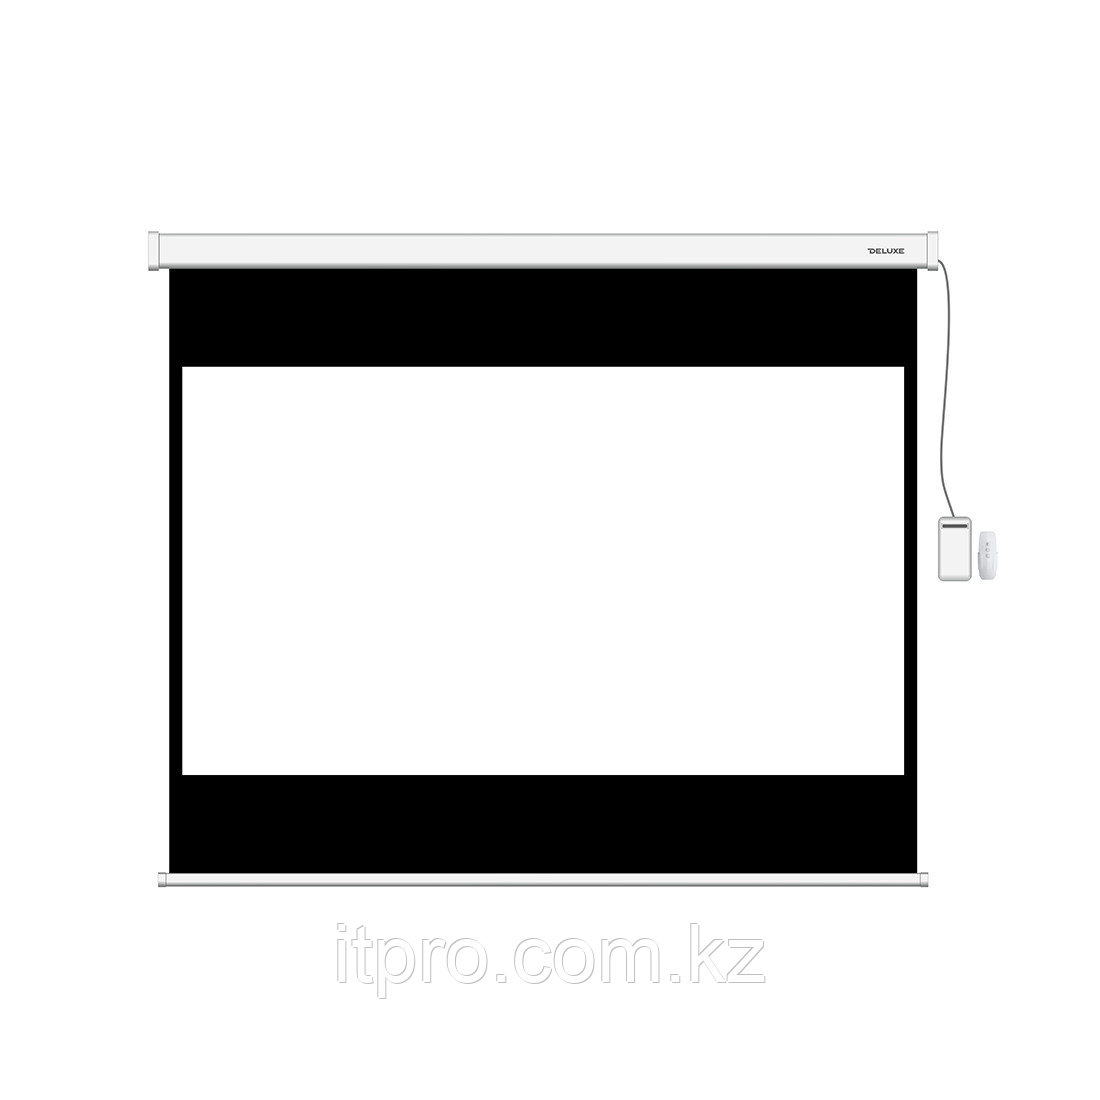 Экран моторизированный Deluxe DLS-ERC274-206W